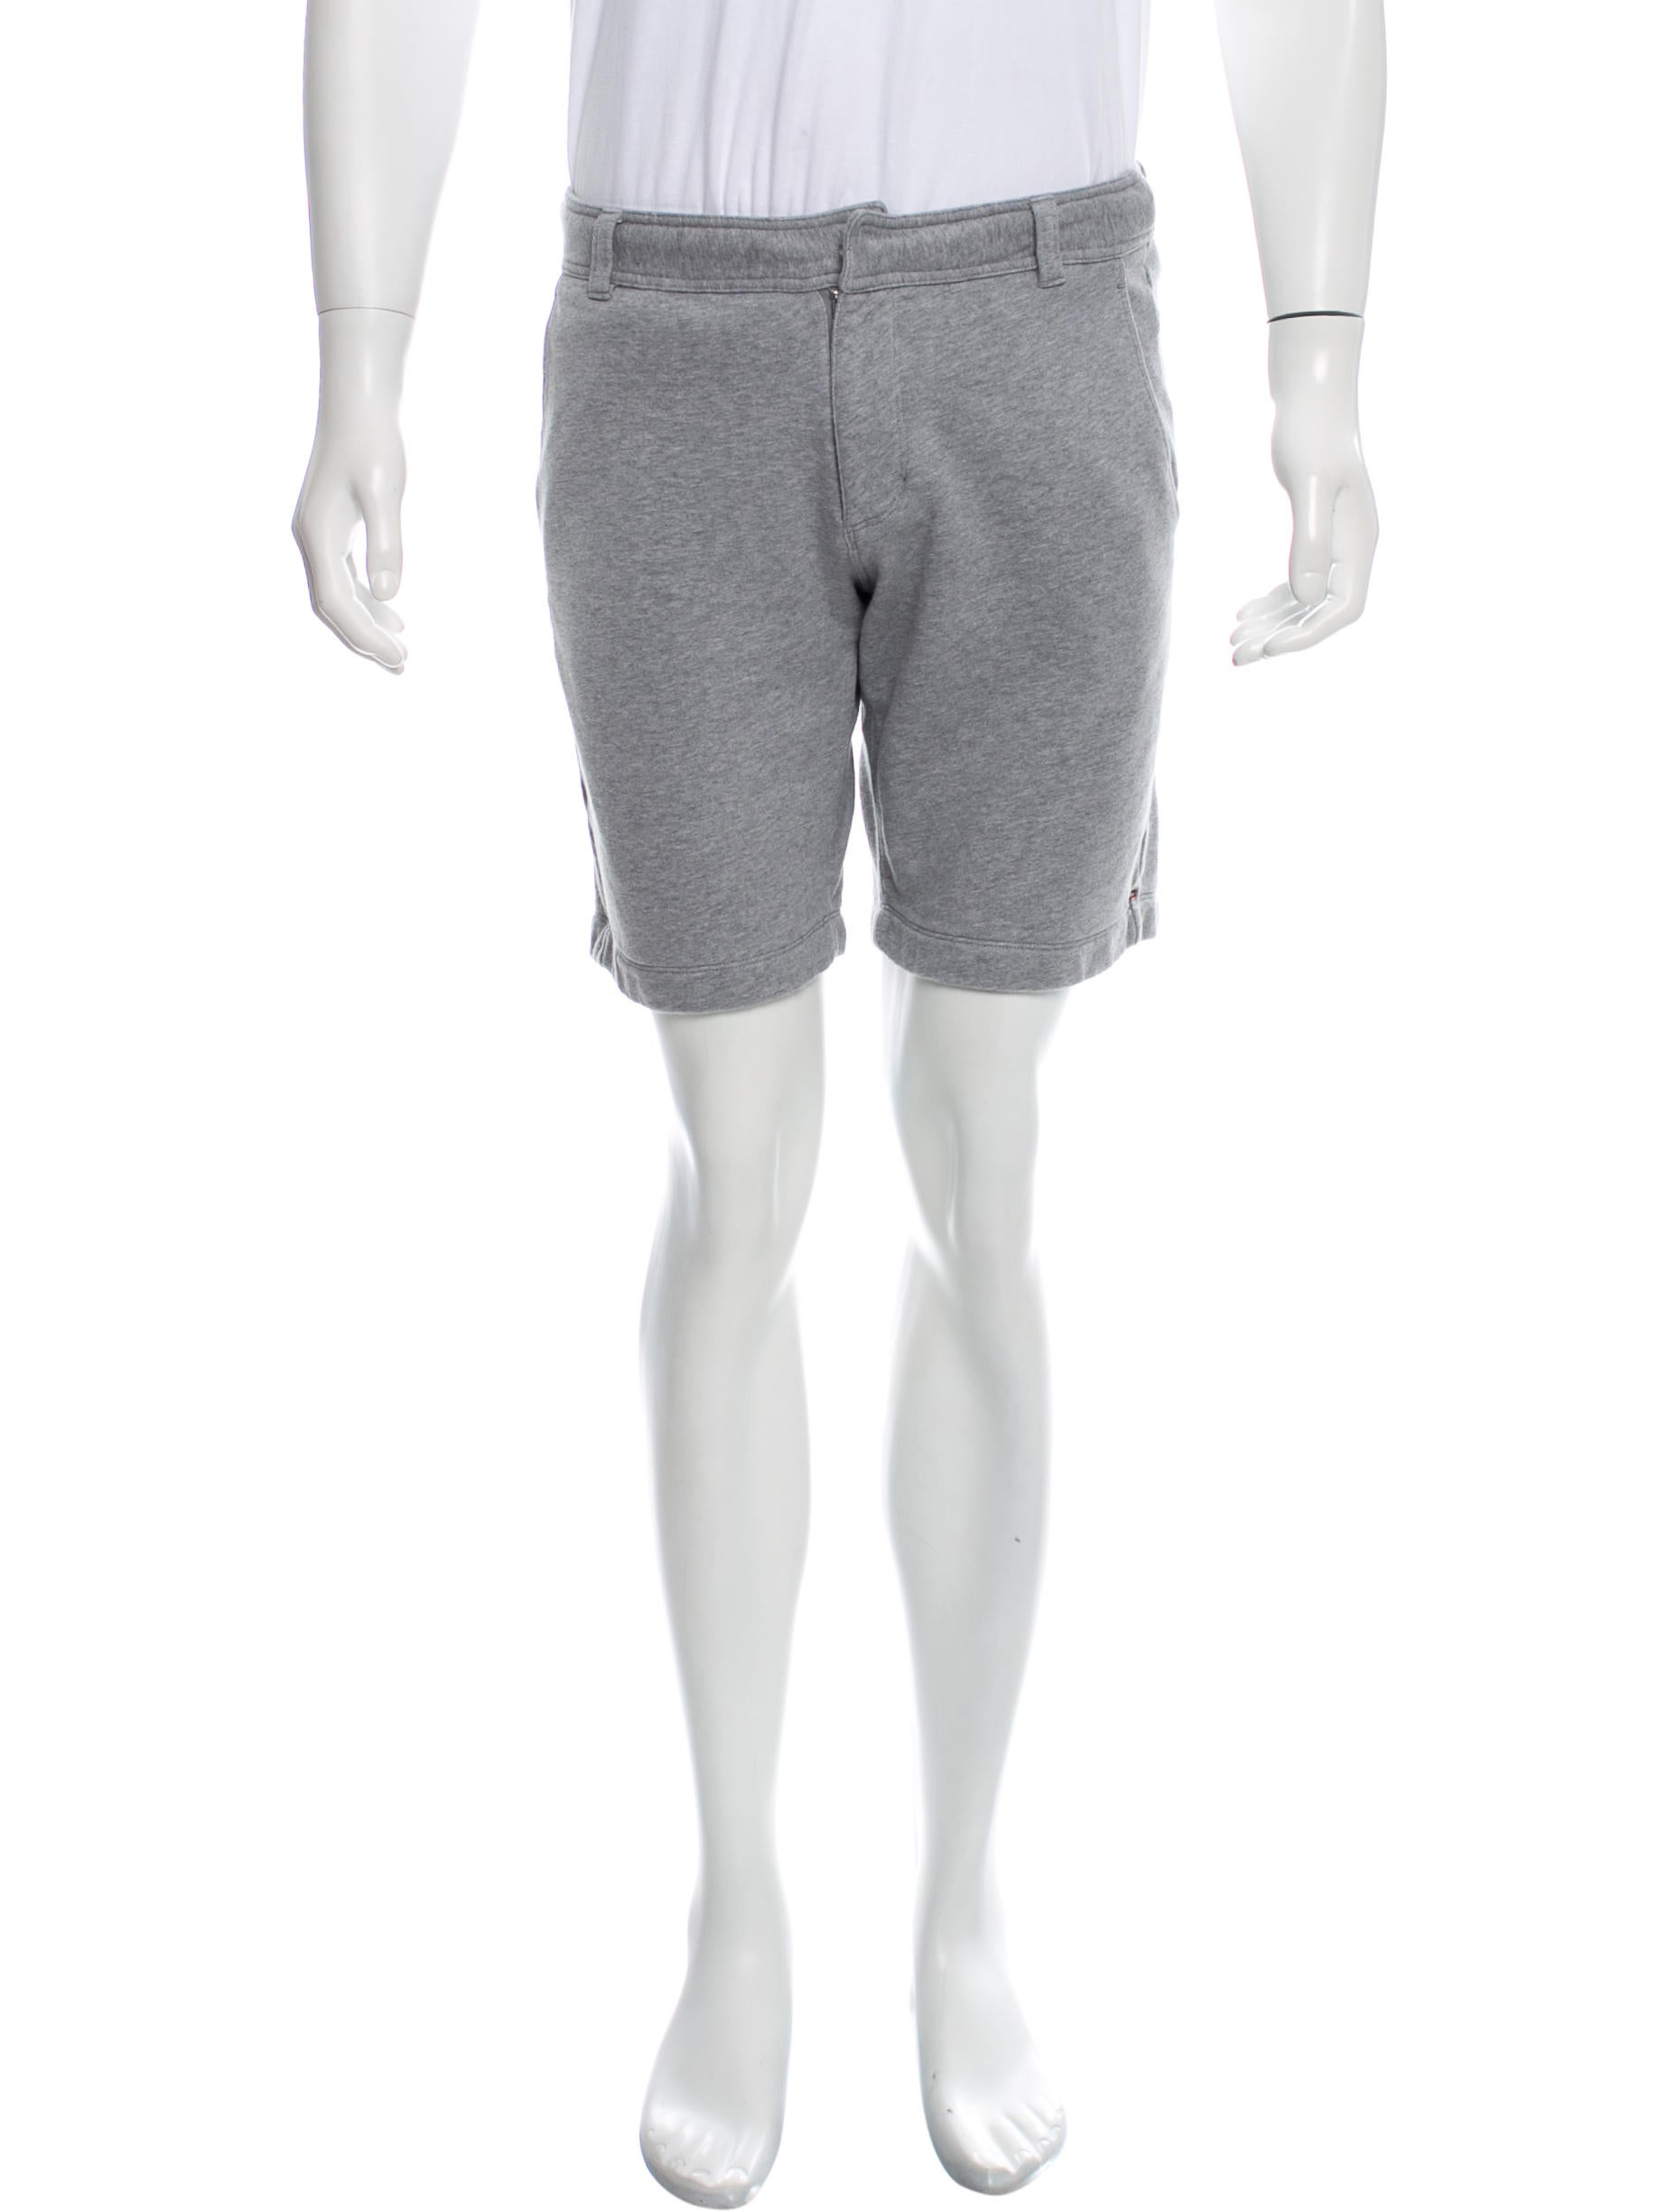 Pantalone Corto Jogger Shorts